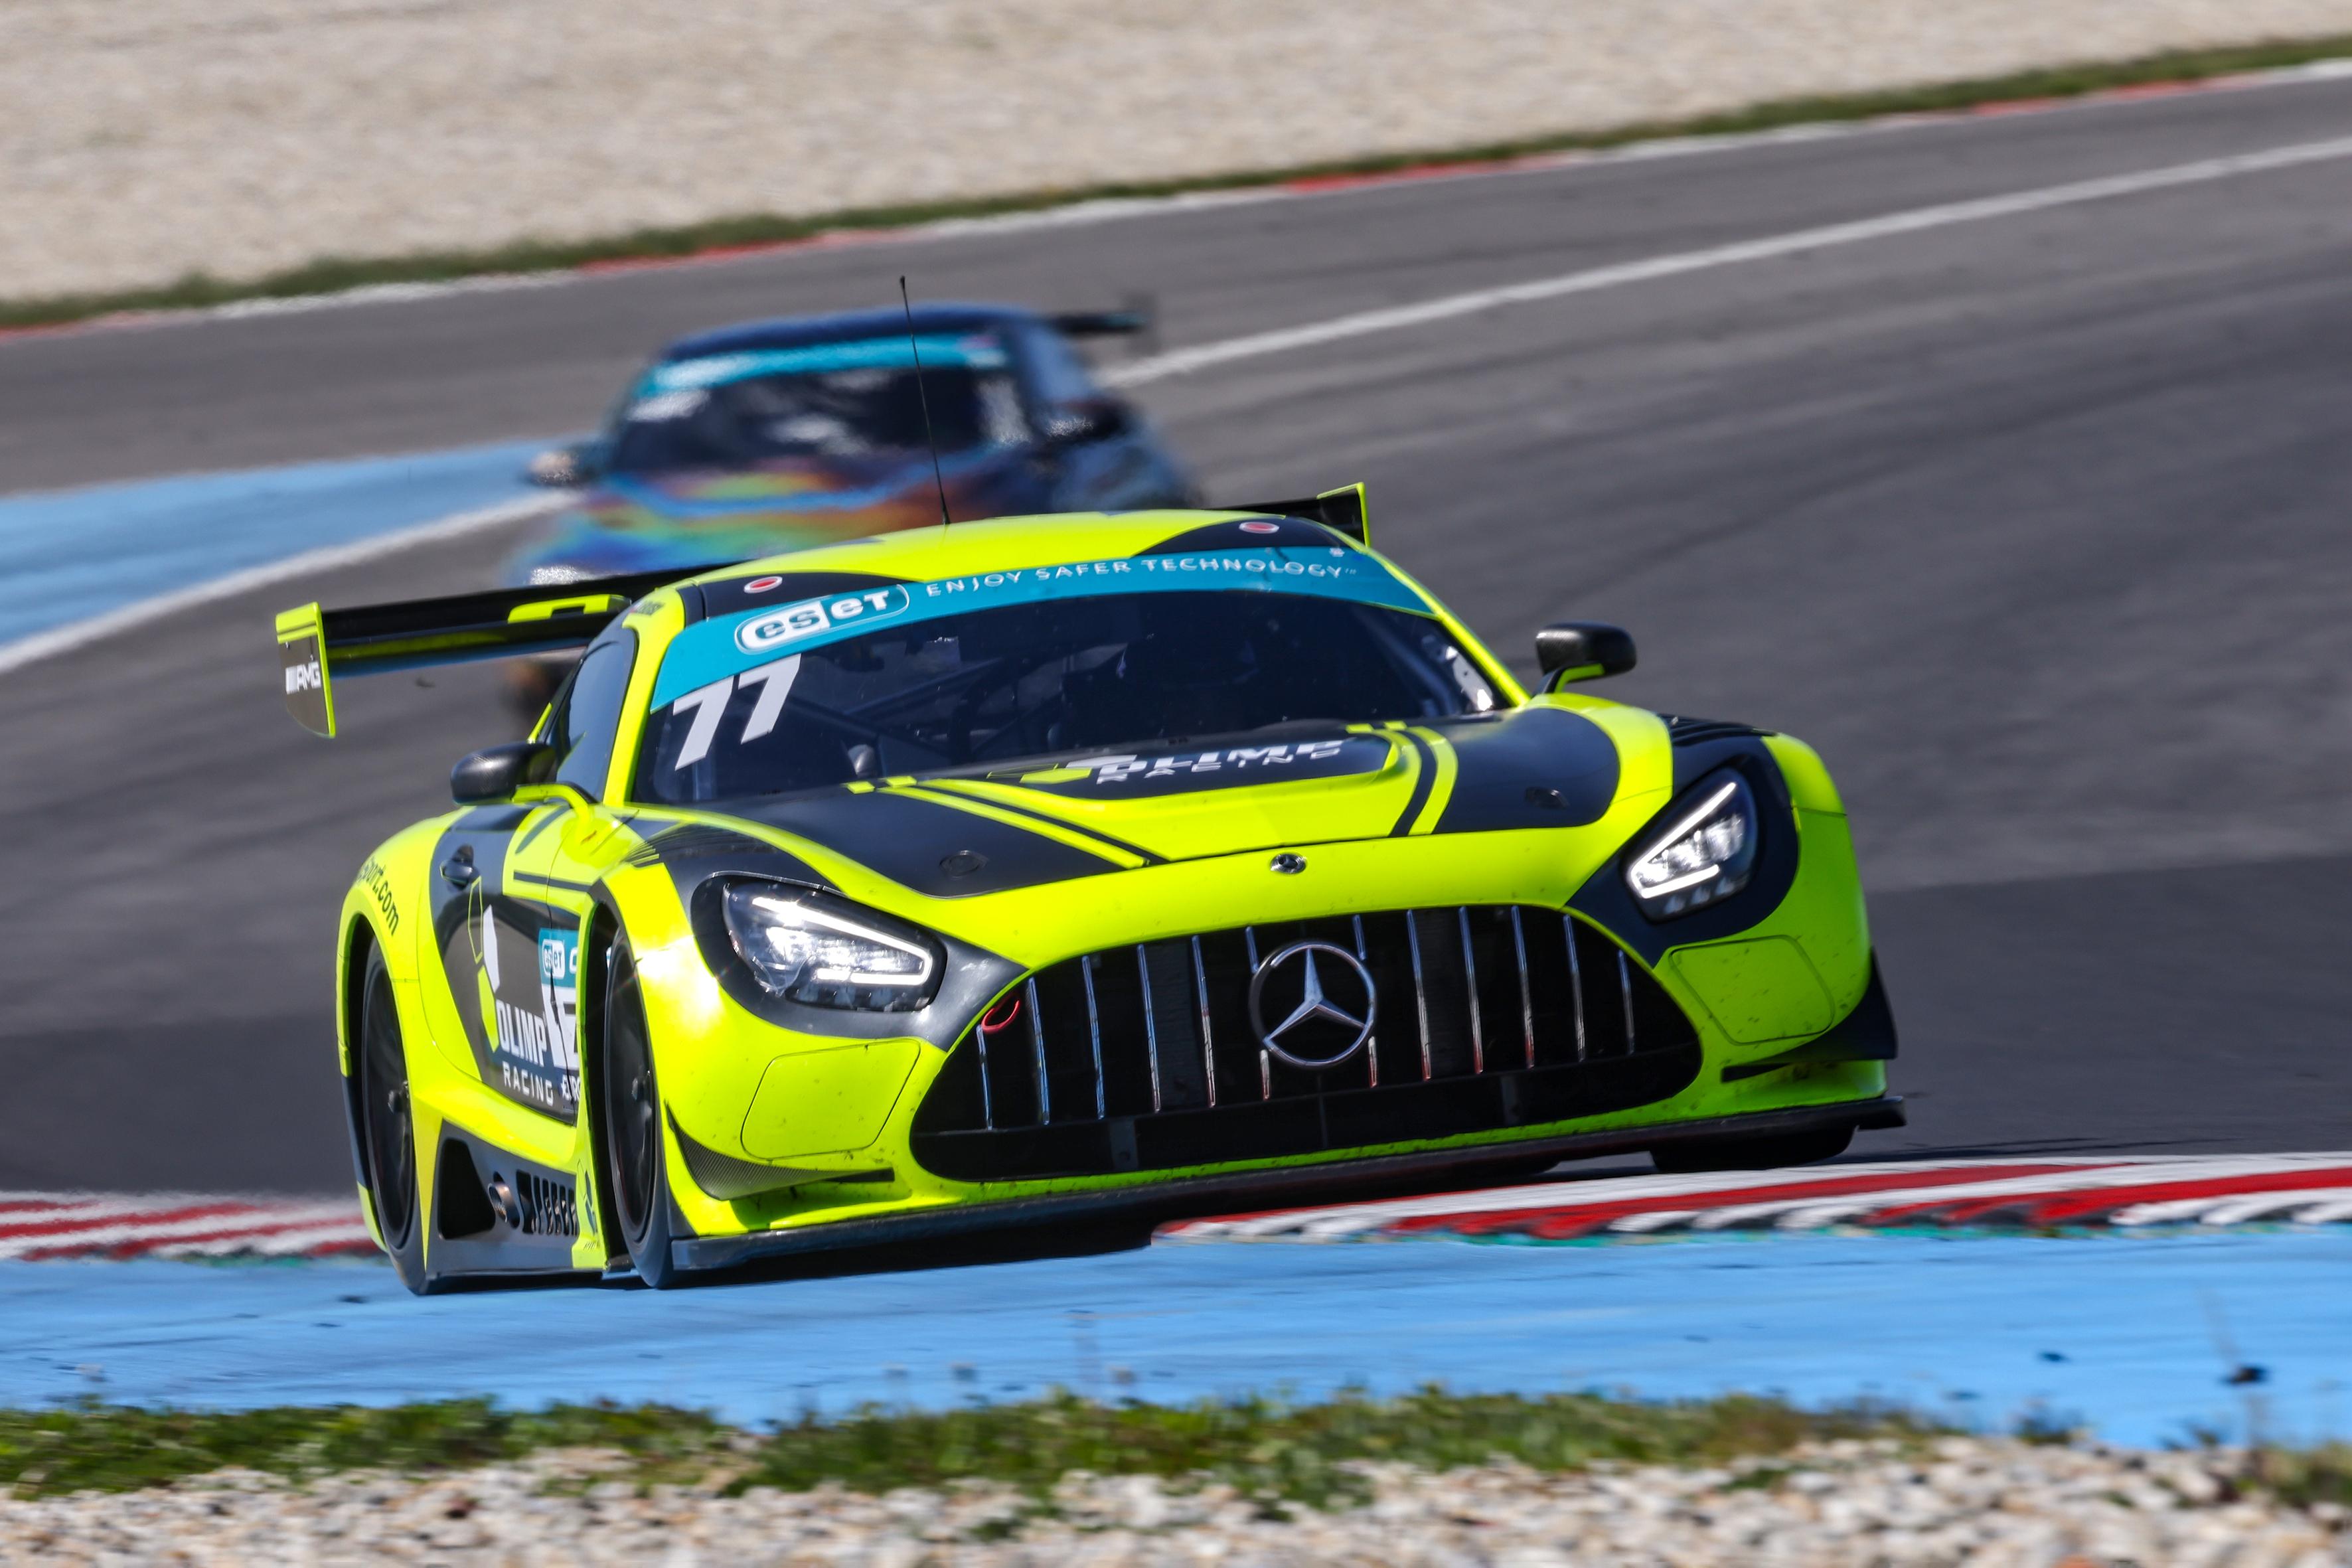 Jedlinski dominates GT3 Endurance races